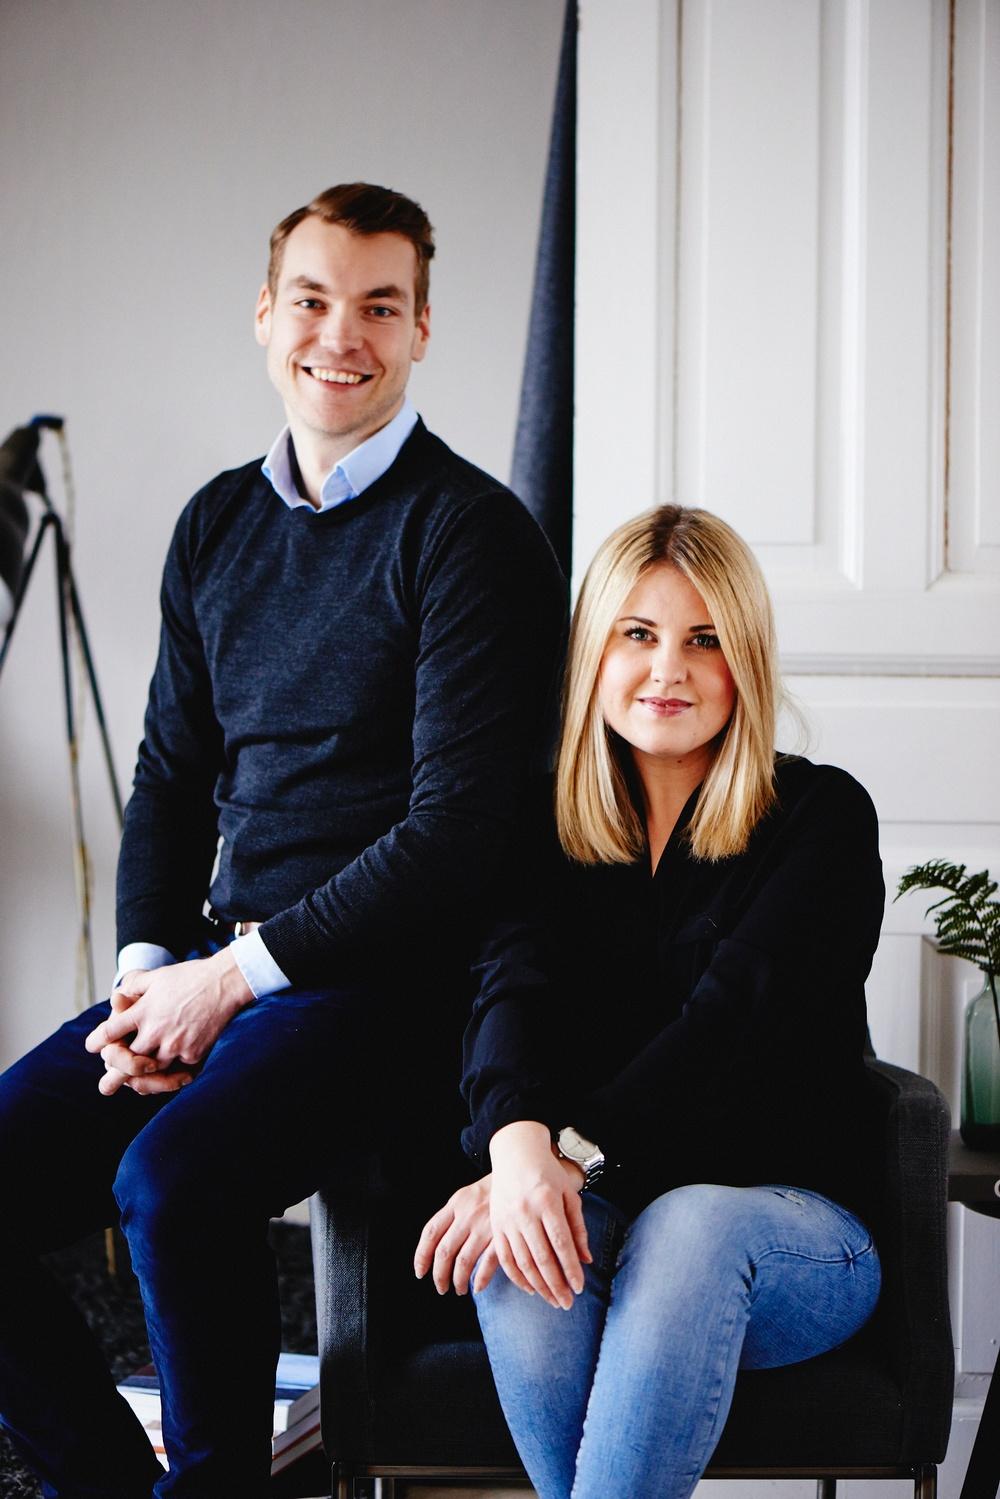 Simon Werner Zankl och Annie Grönblad, grundare av Trustcruit